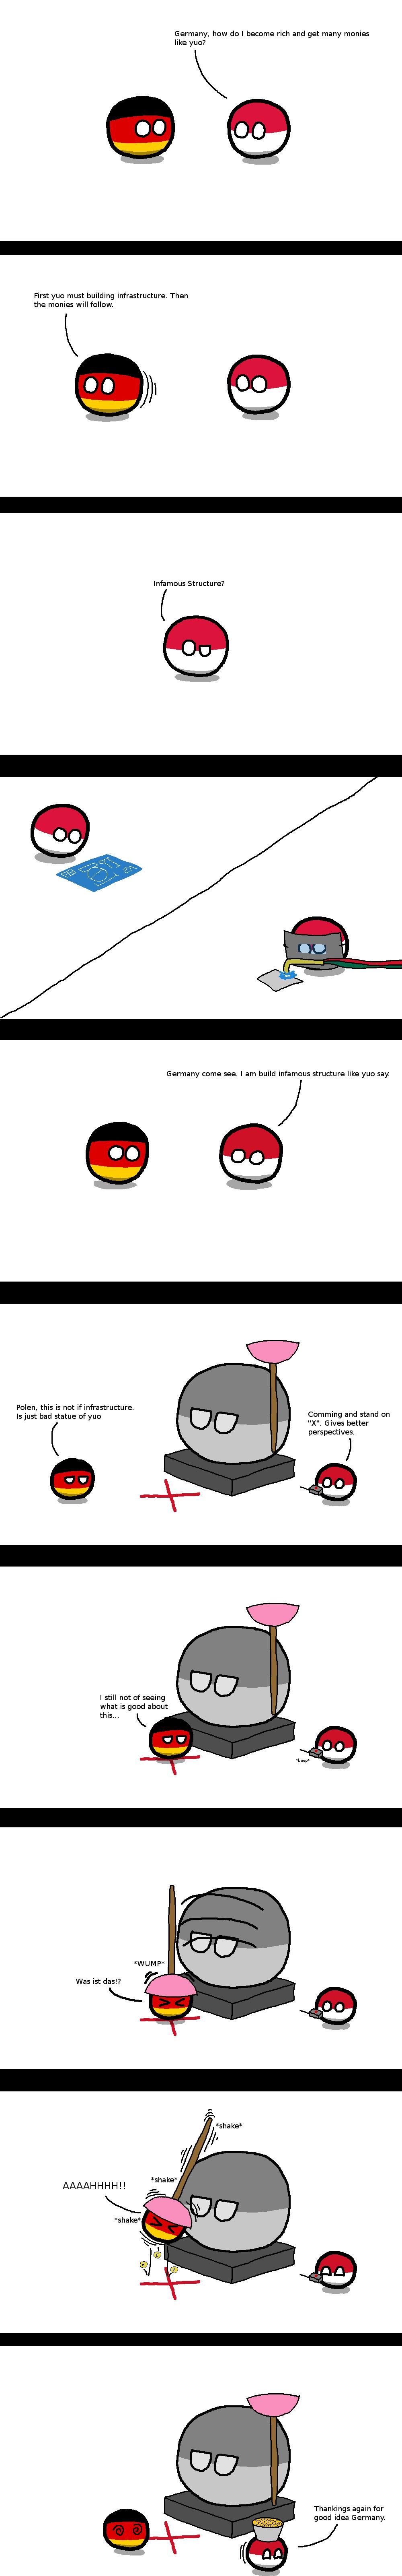 Polish Infrastructure